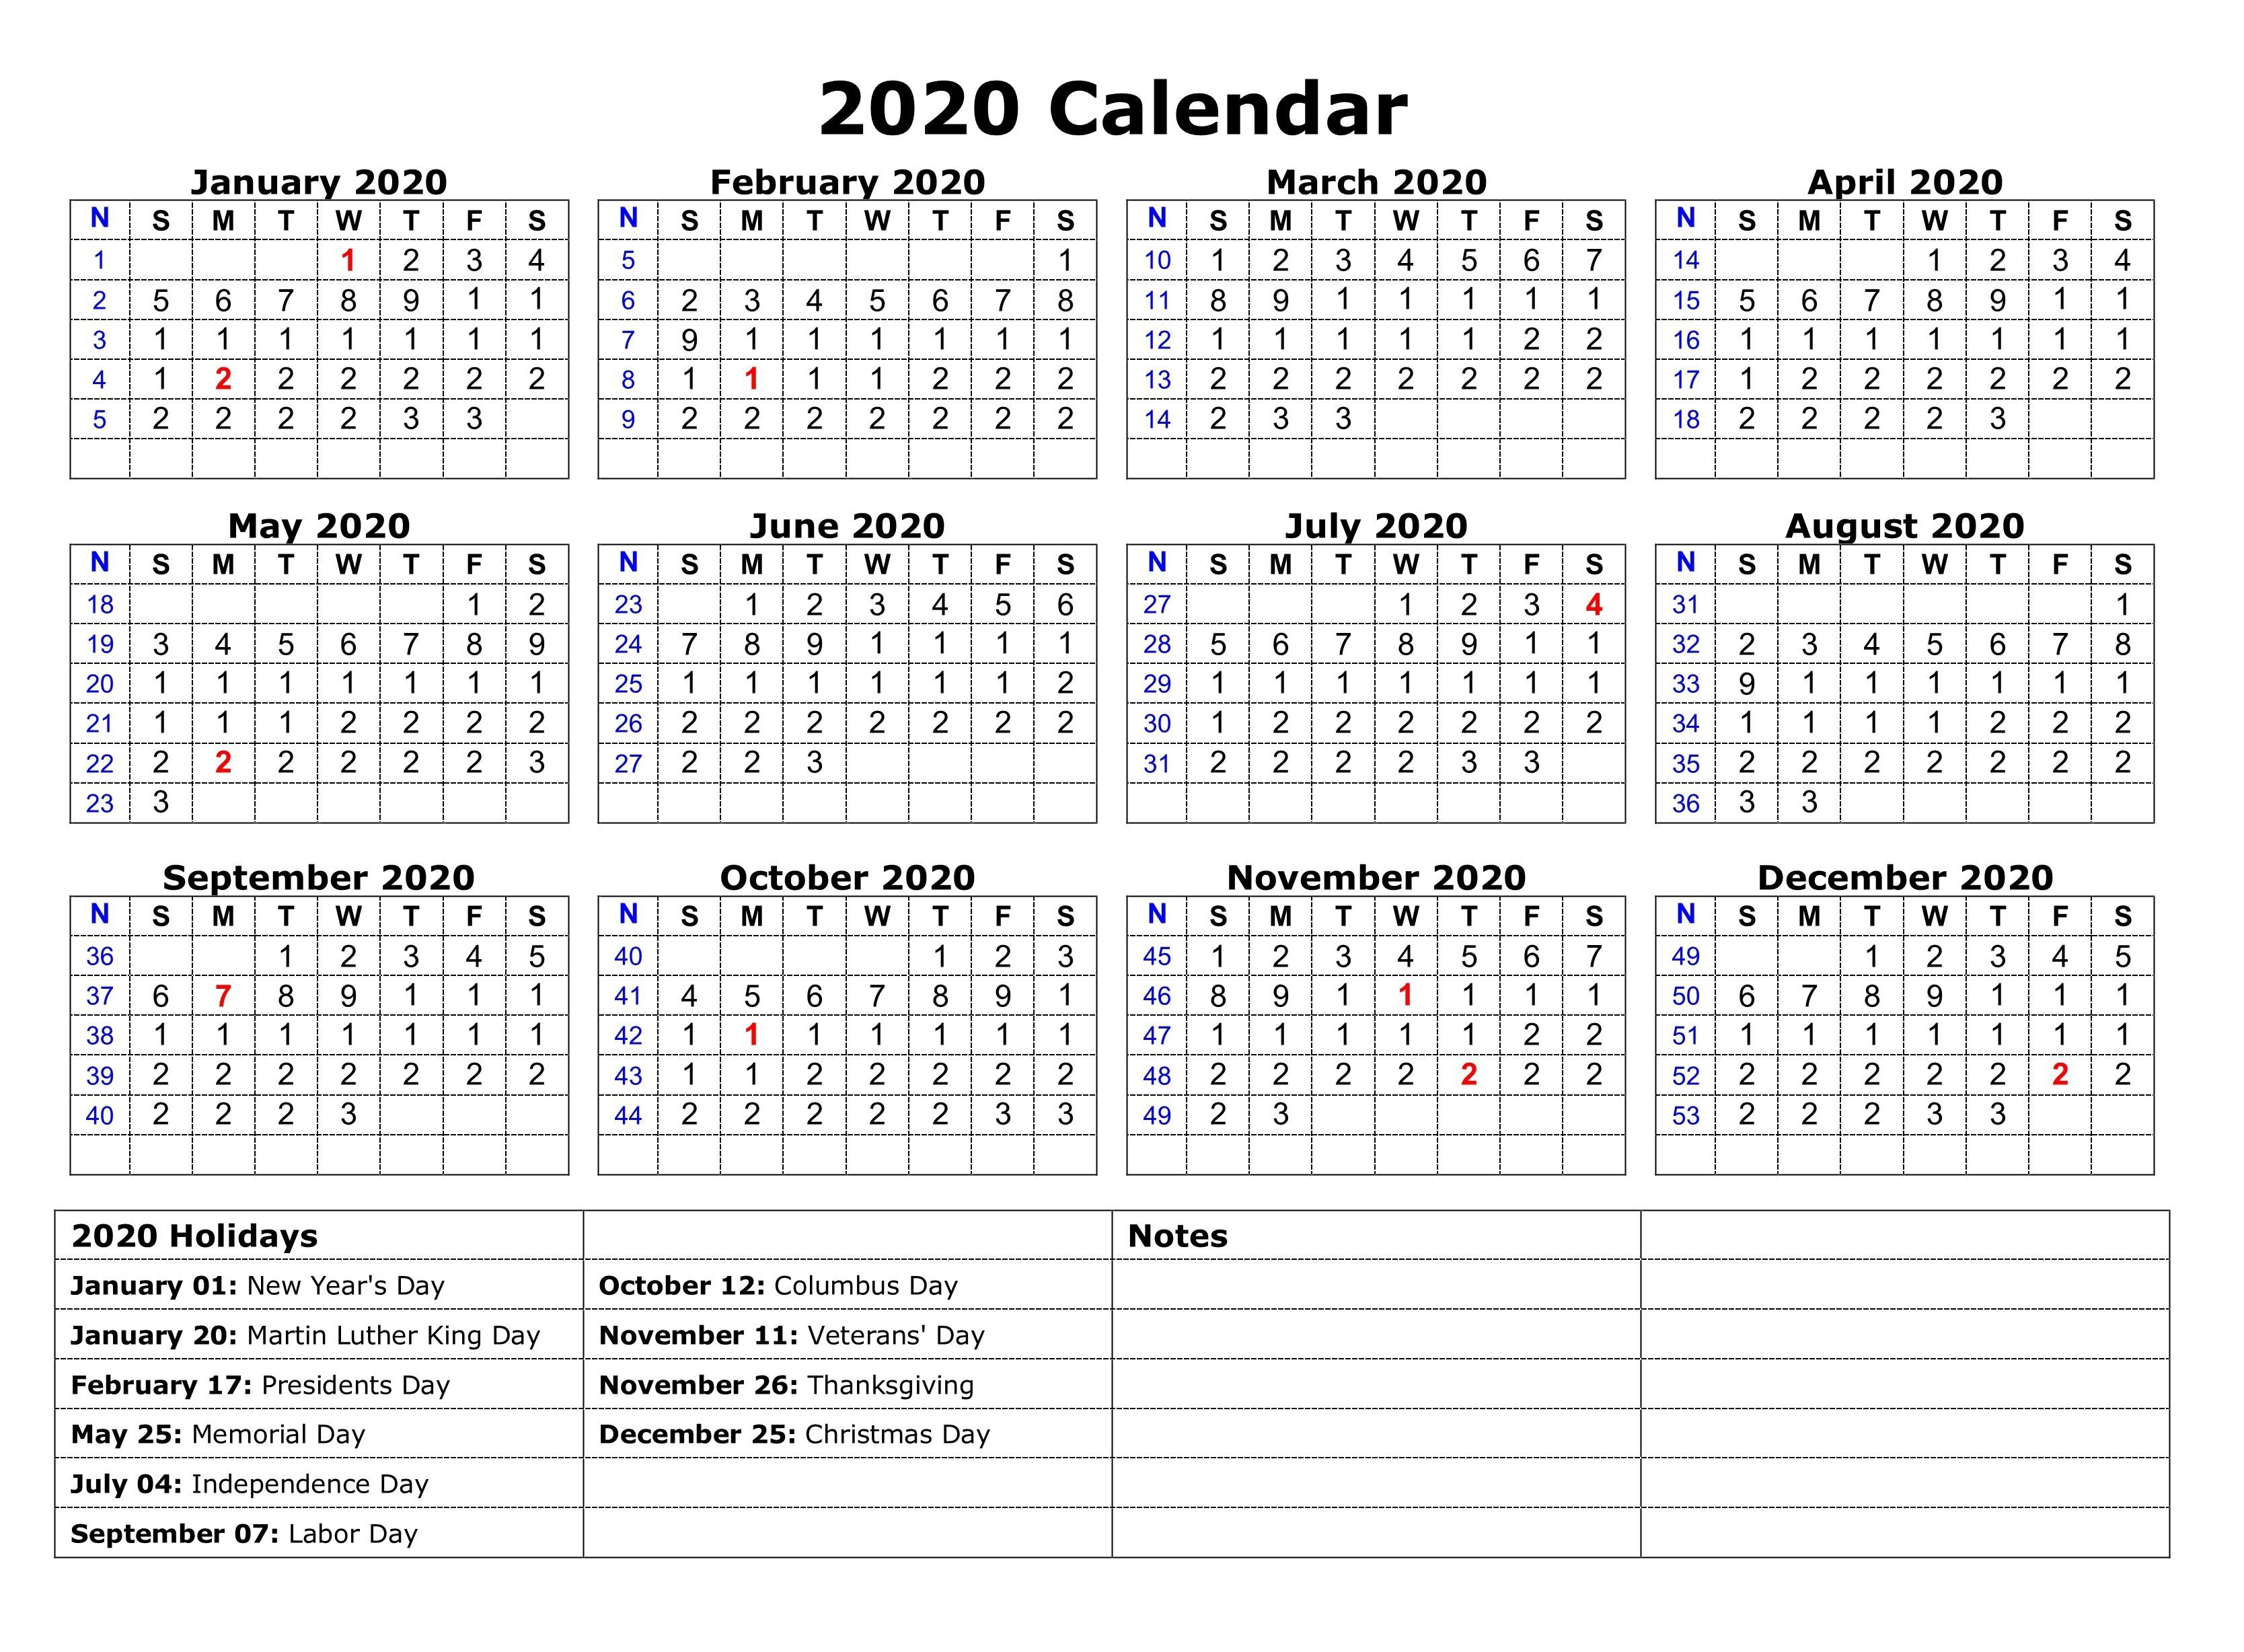 Printable 2020 One Page Holidays Calendar | 2020 Calendars